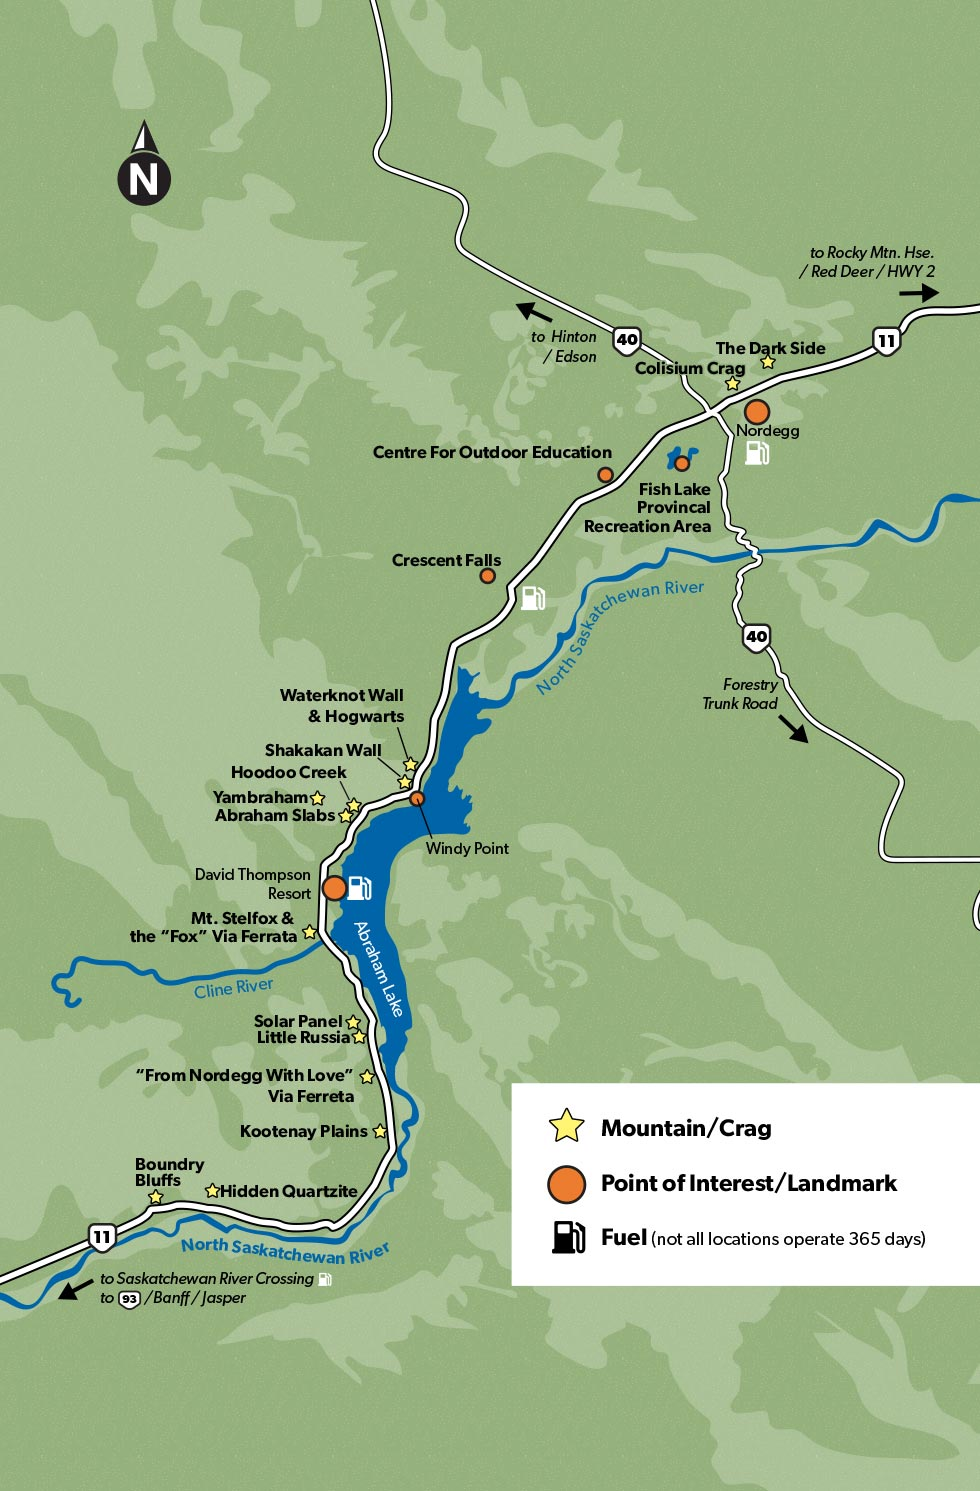 David Thompson Corridor Climbing Area Overview